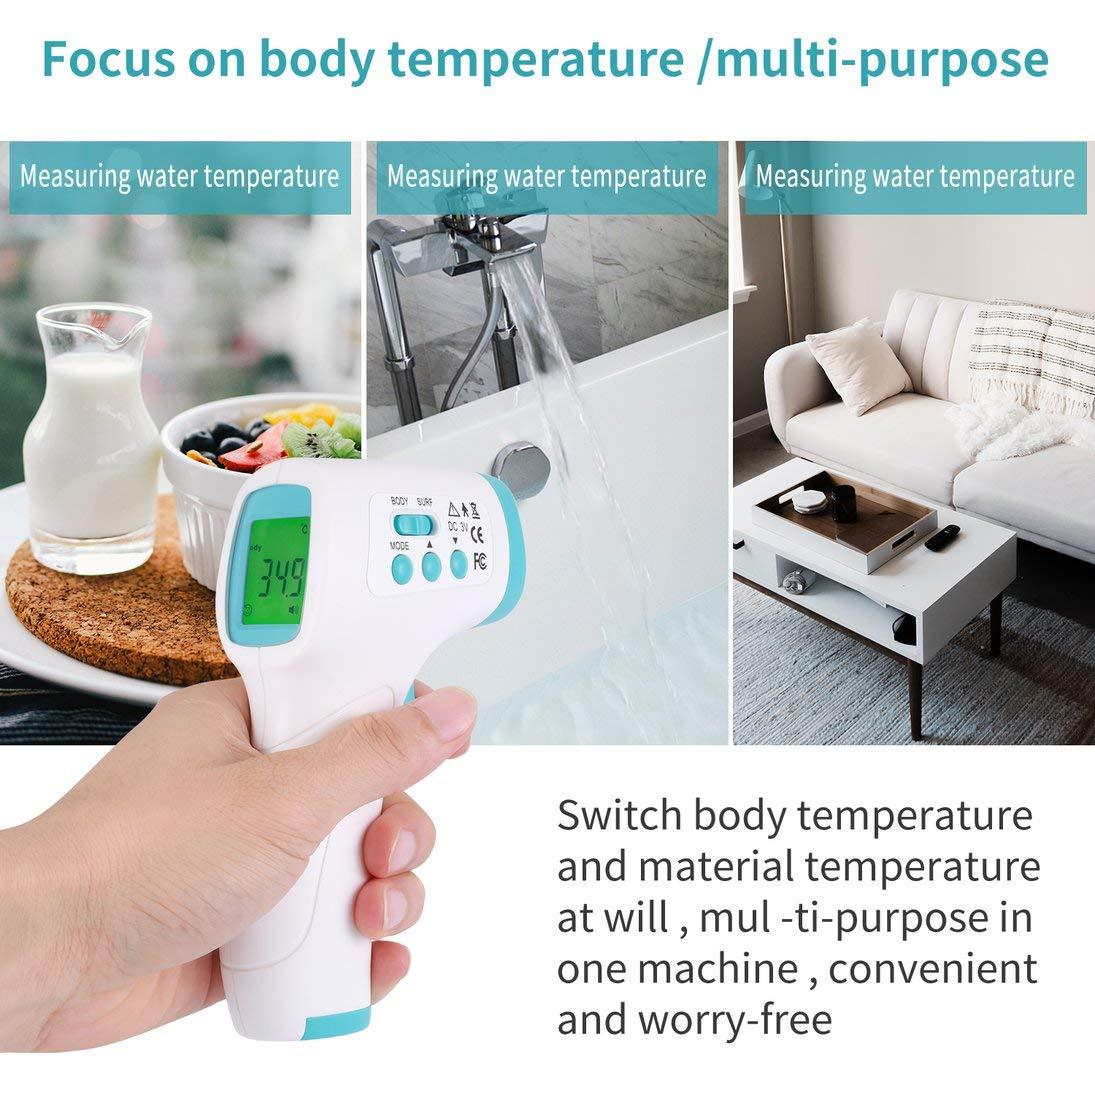 XINFULUK Handheld Portable Ber/ührungslose Infrarot-Stirntemperaturpistole Hochpr/äzises Thermometer-Temperaturmessger/ät 208A